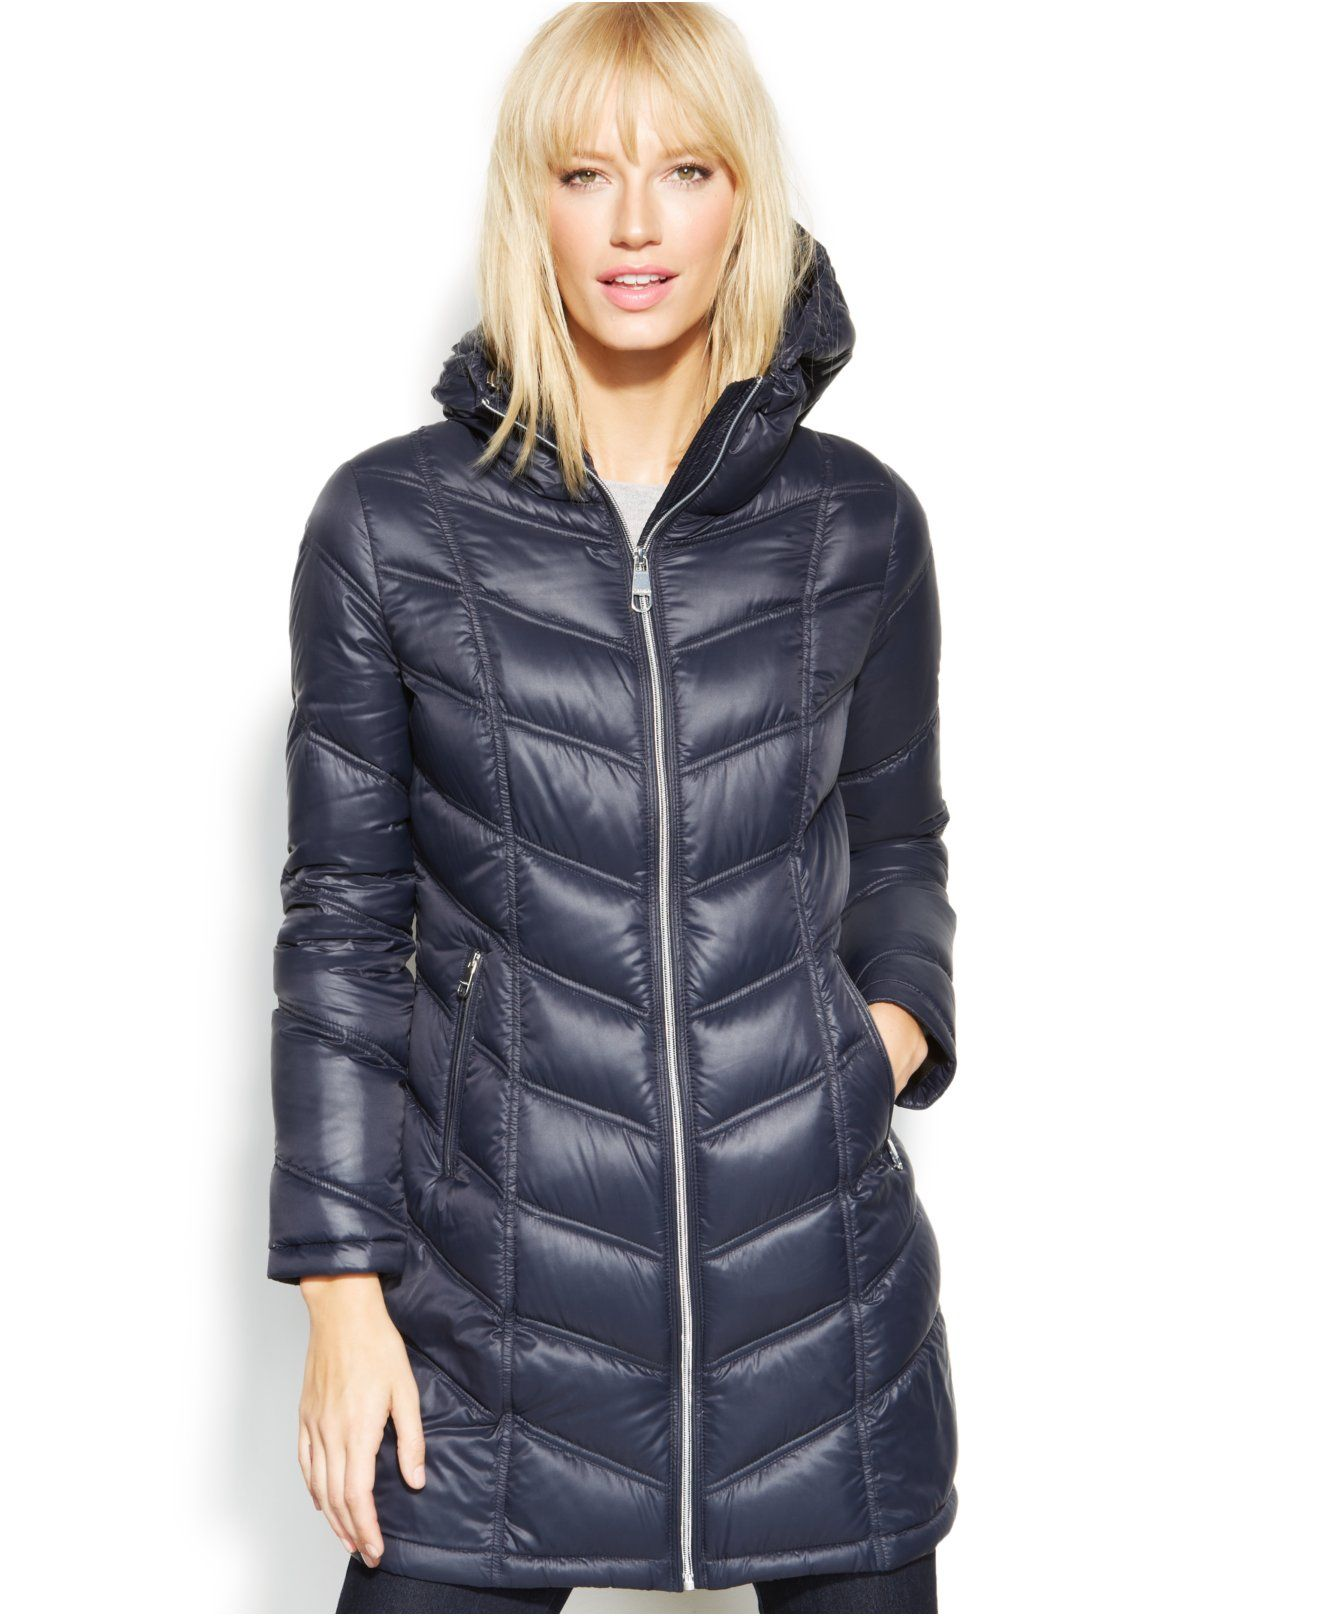 Calvin Klein Quilted Down Packable Puffer Coat - Coats - Women - Macy s 8ac0371f5d